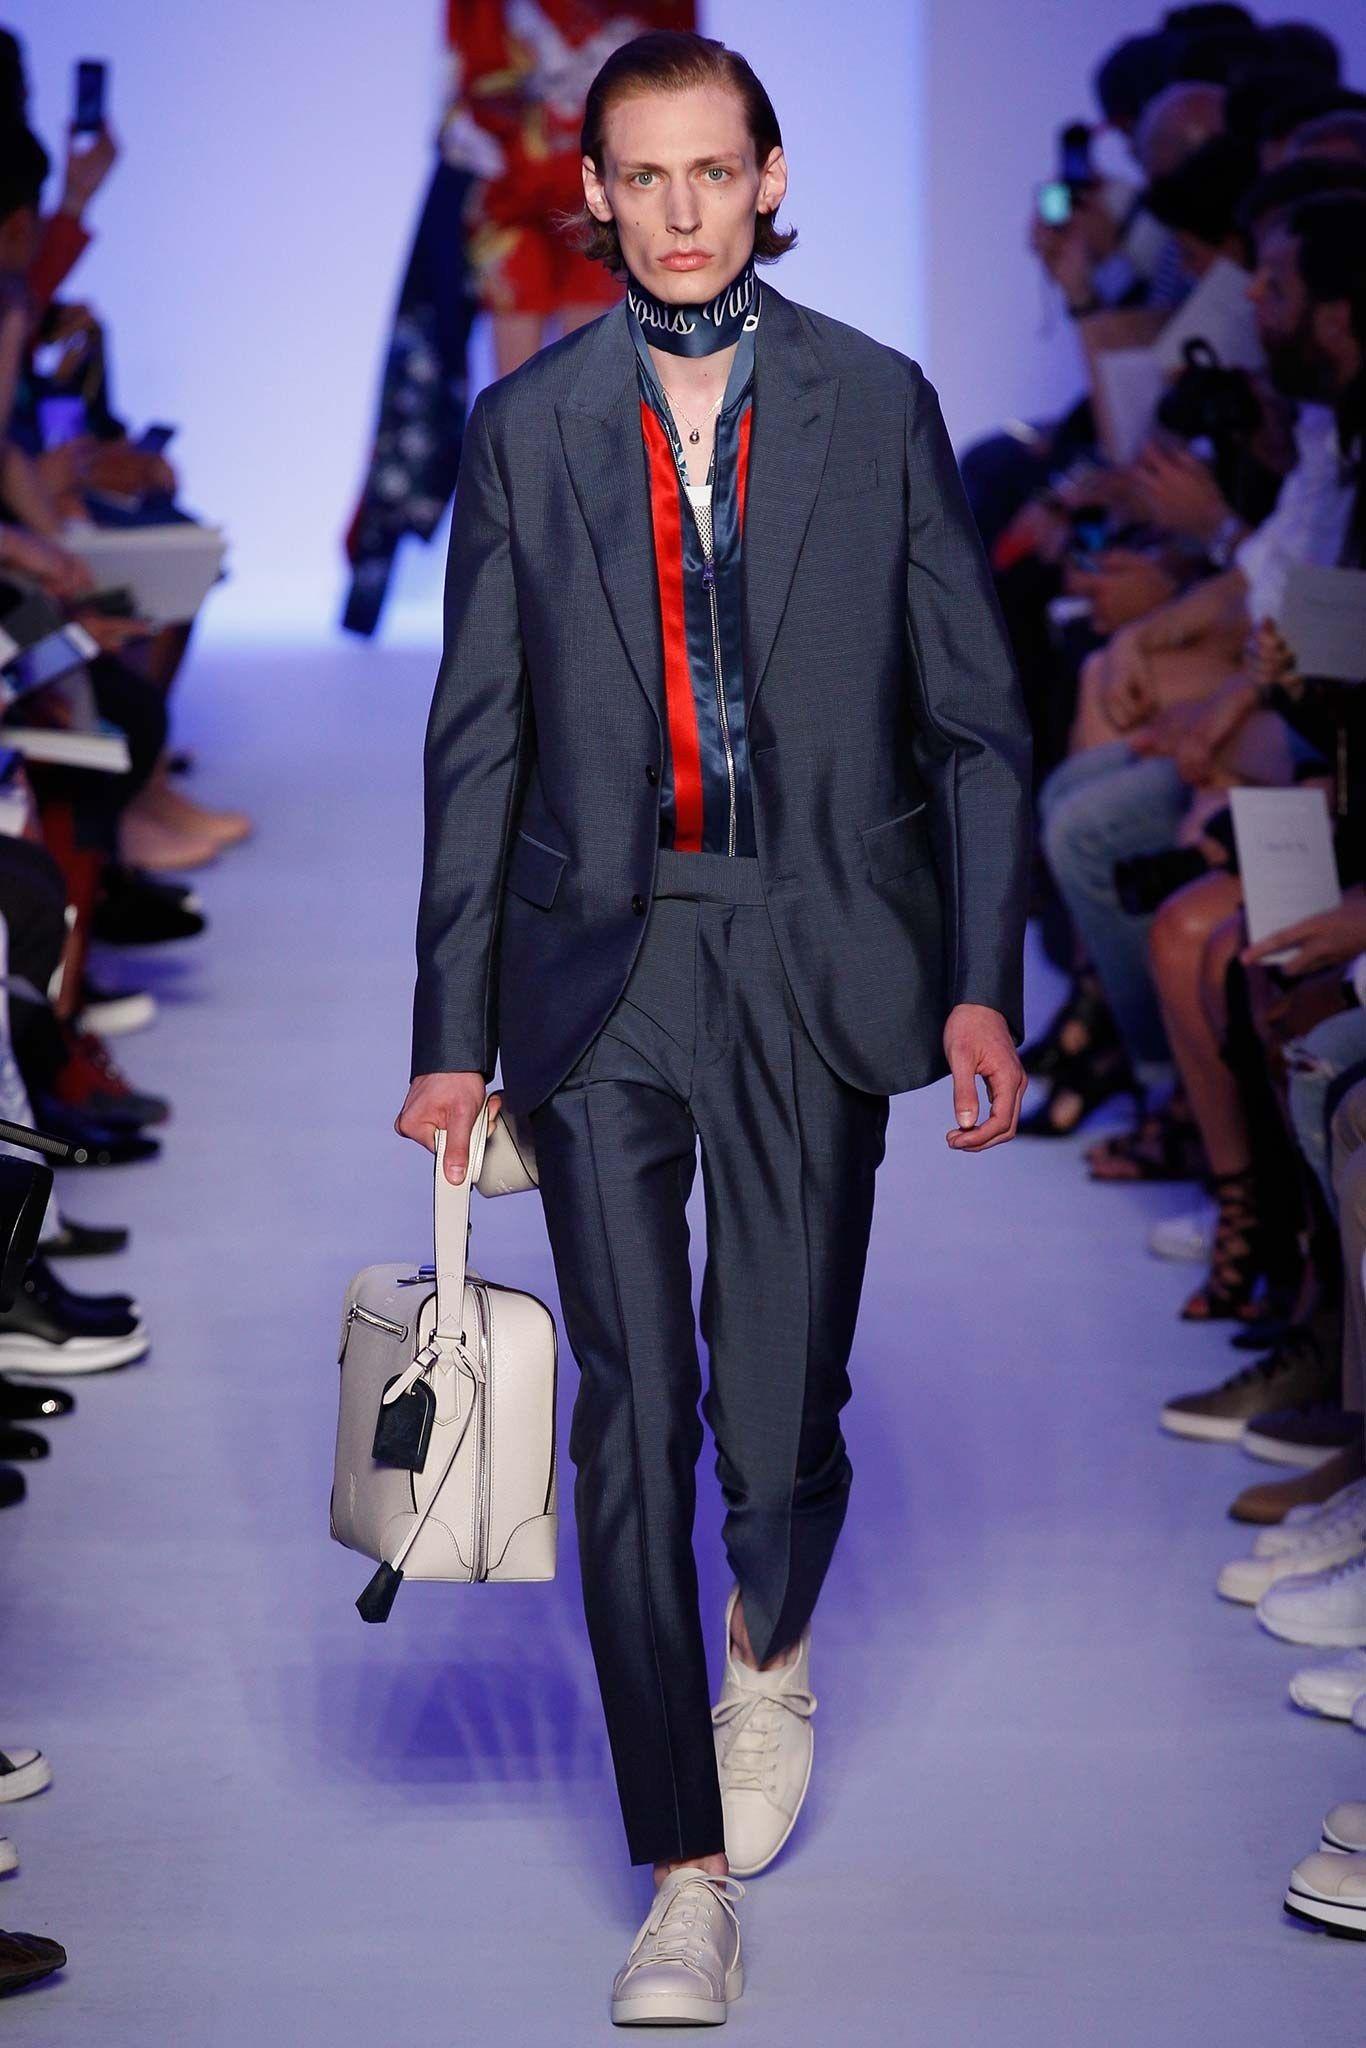 7636c1d35c5ed Louis Vuitton Spring 2016 Menswear Fashion Show   style   Menswear ...